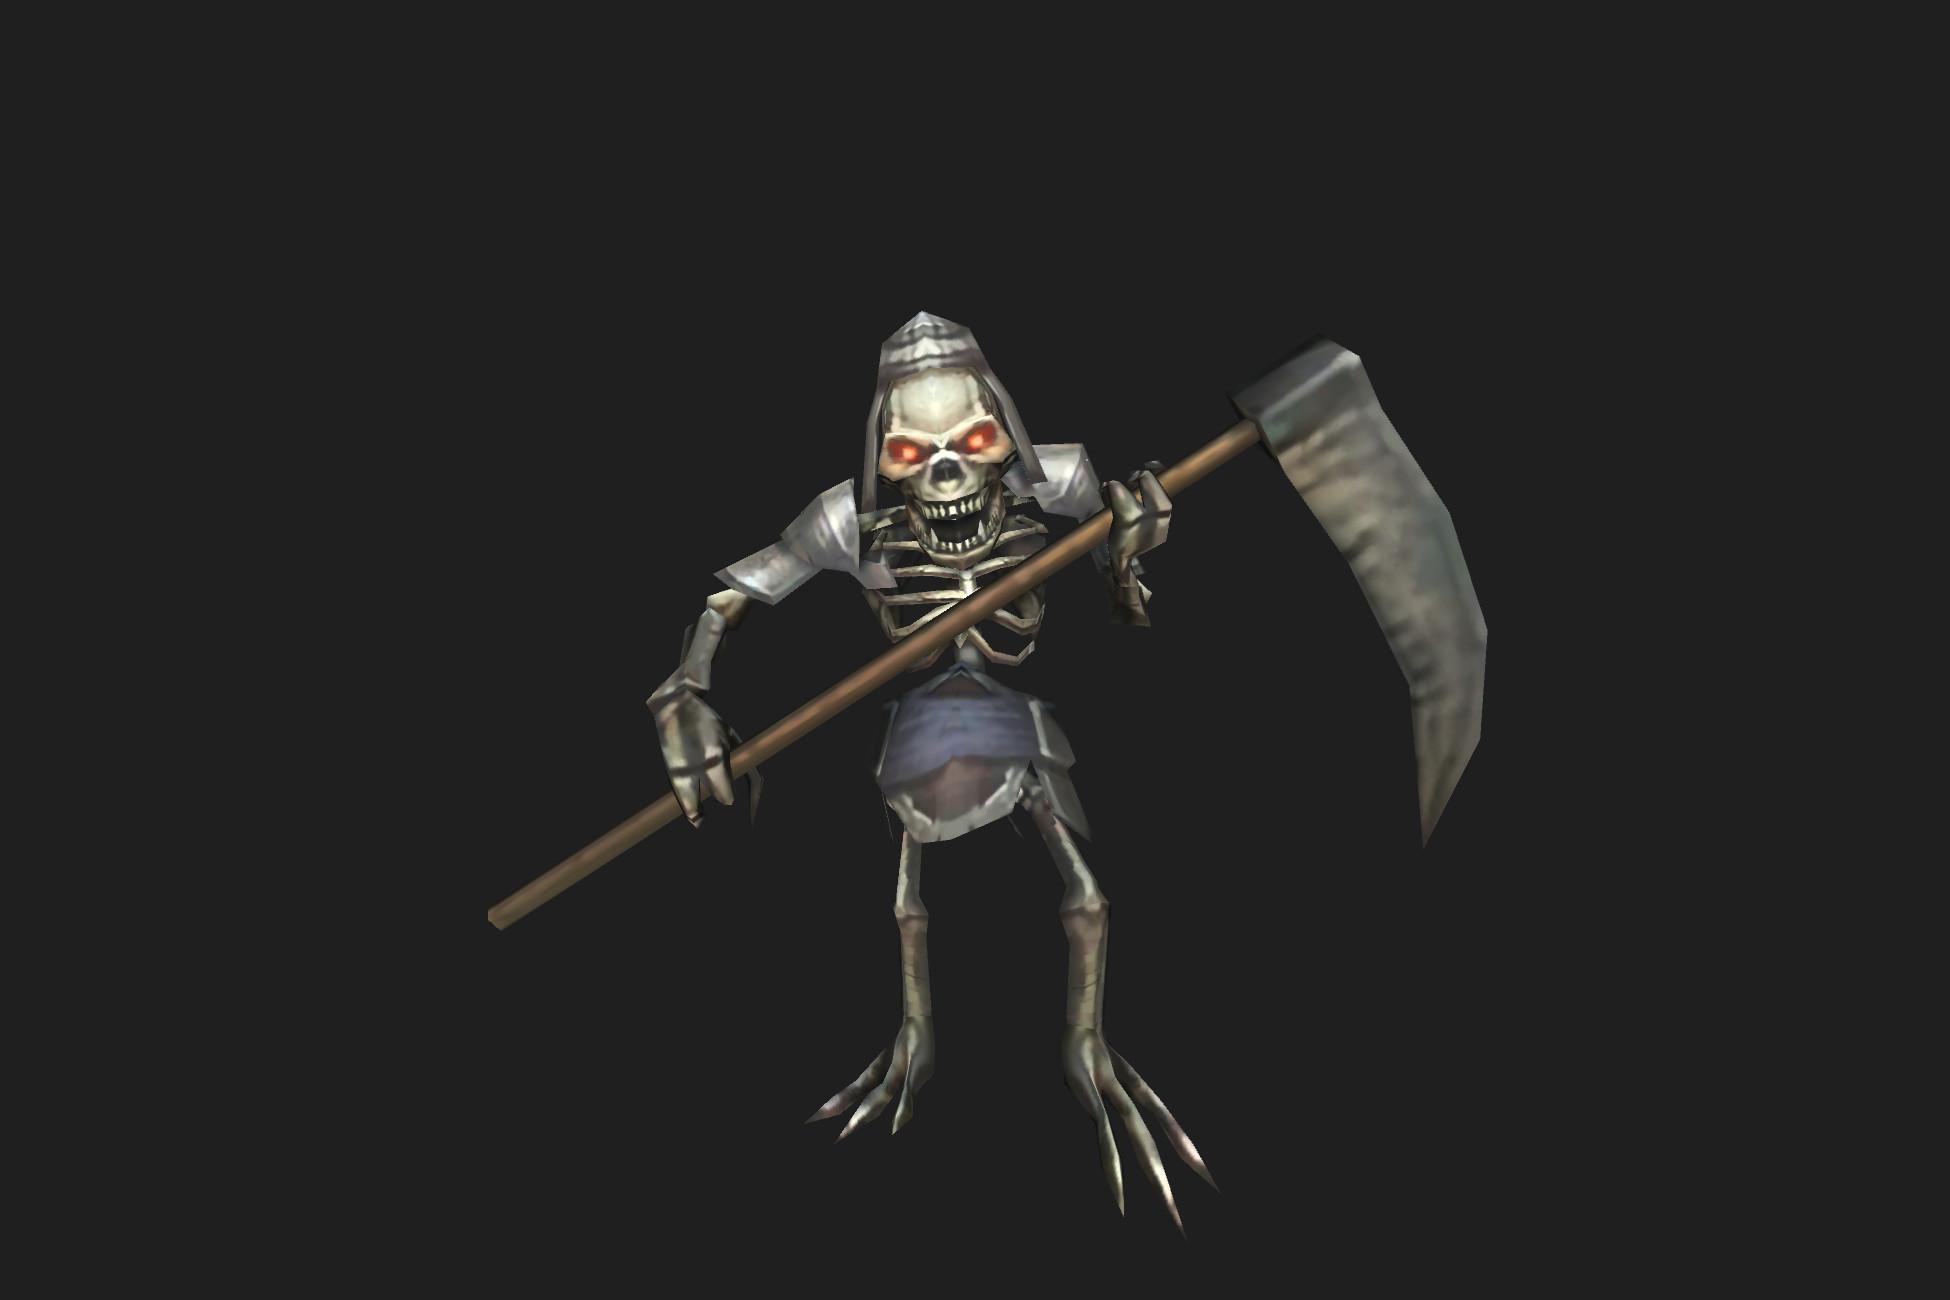 Skeleton Soldier #2